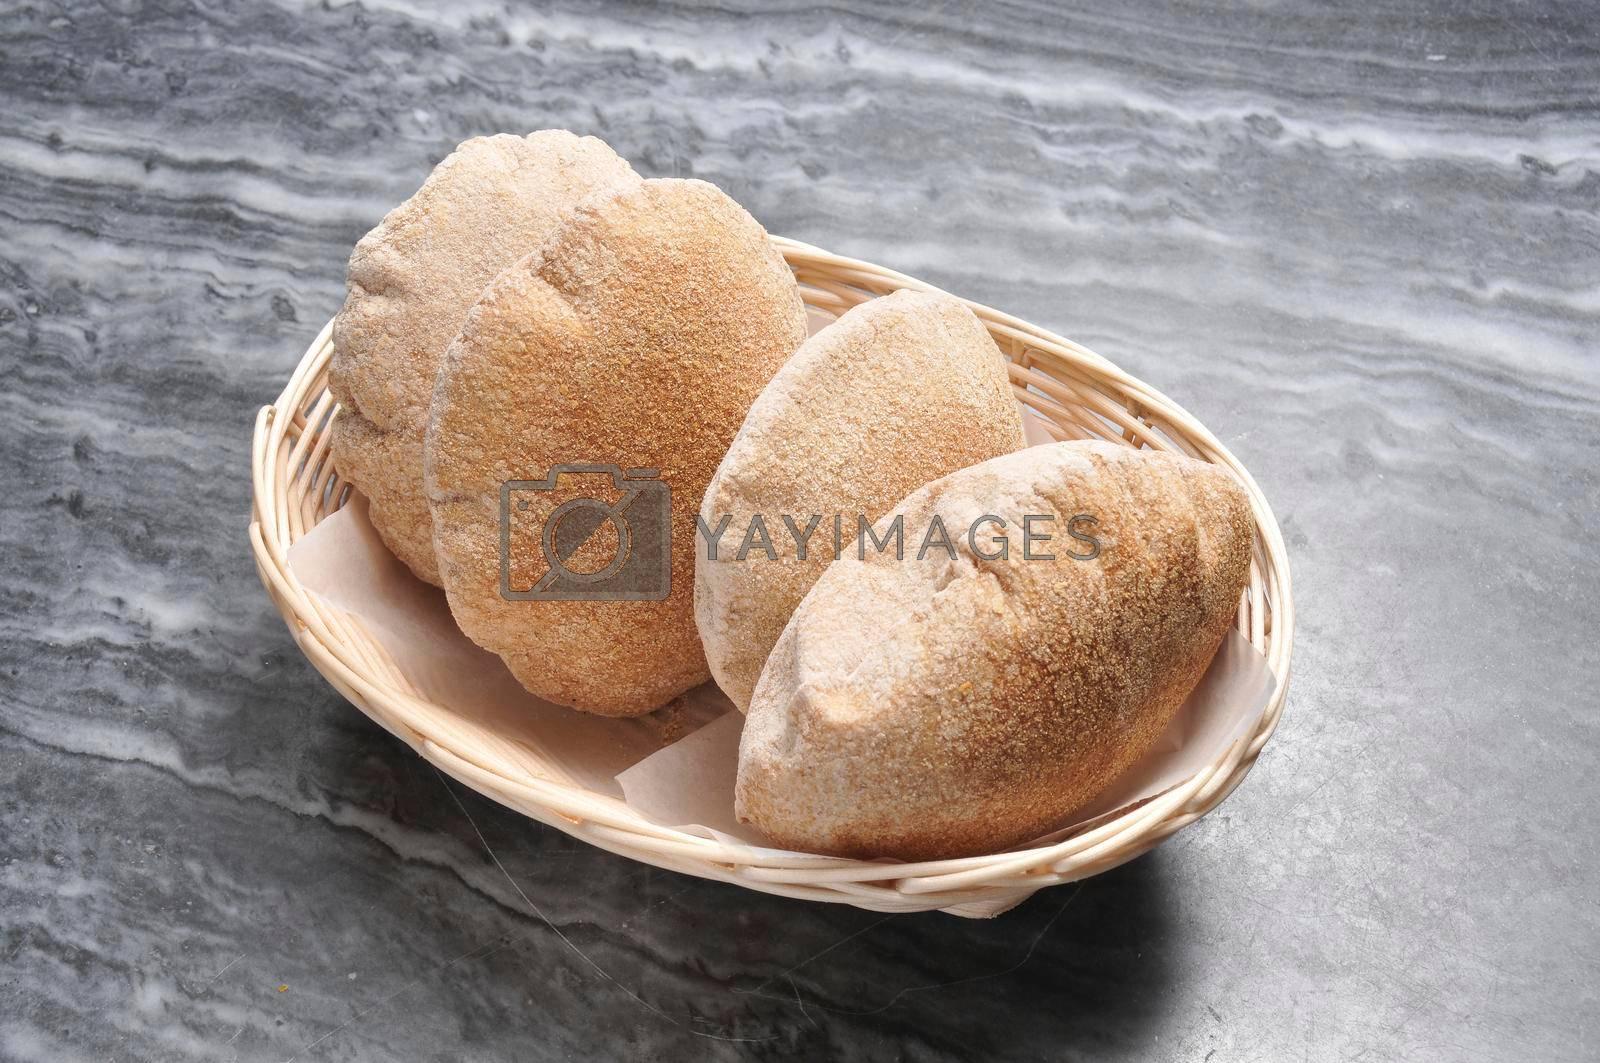 Delicious mediterranean cuisine known as pita bread